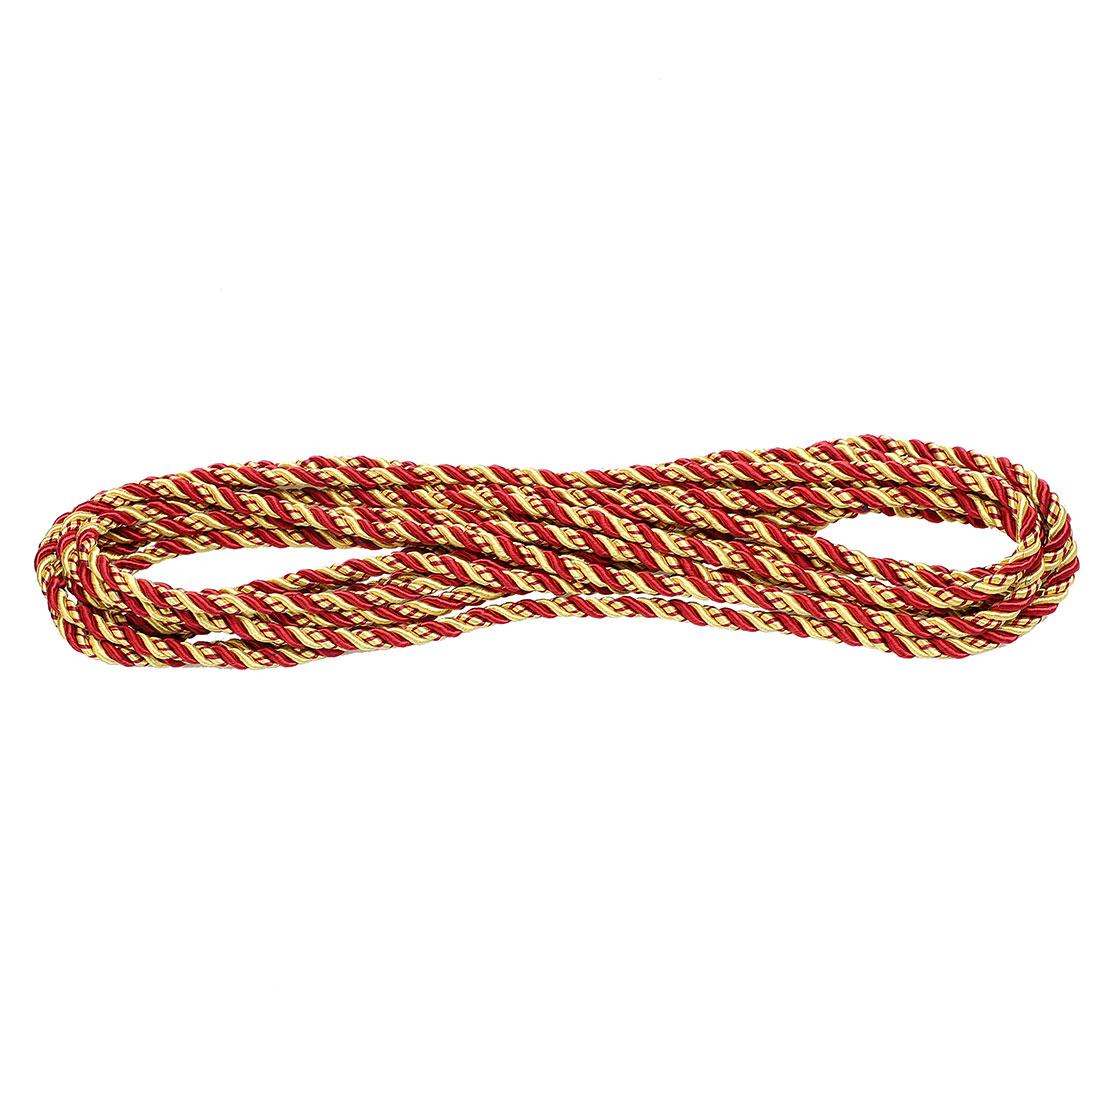 Window Curtain Twisted Braid Trim Rope Cord String 5M 5.5 Yards Red